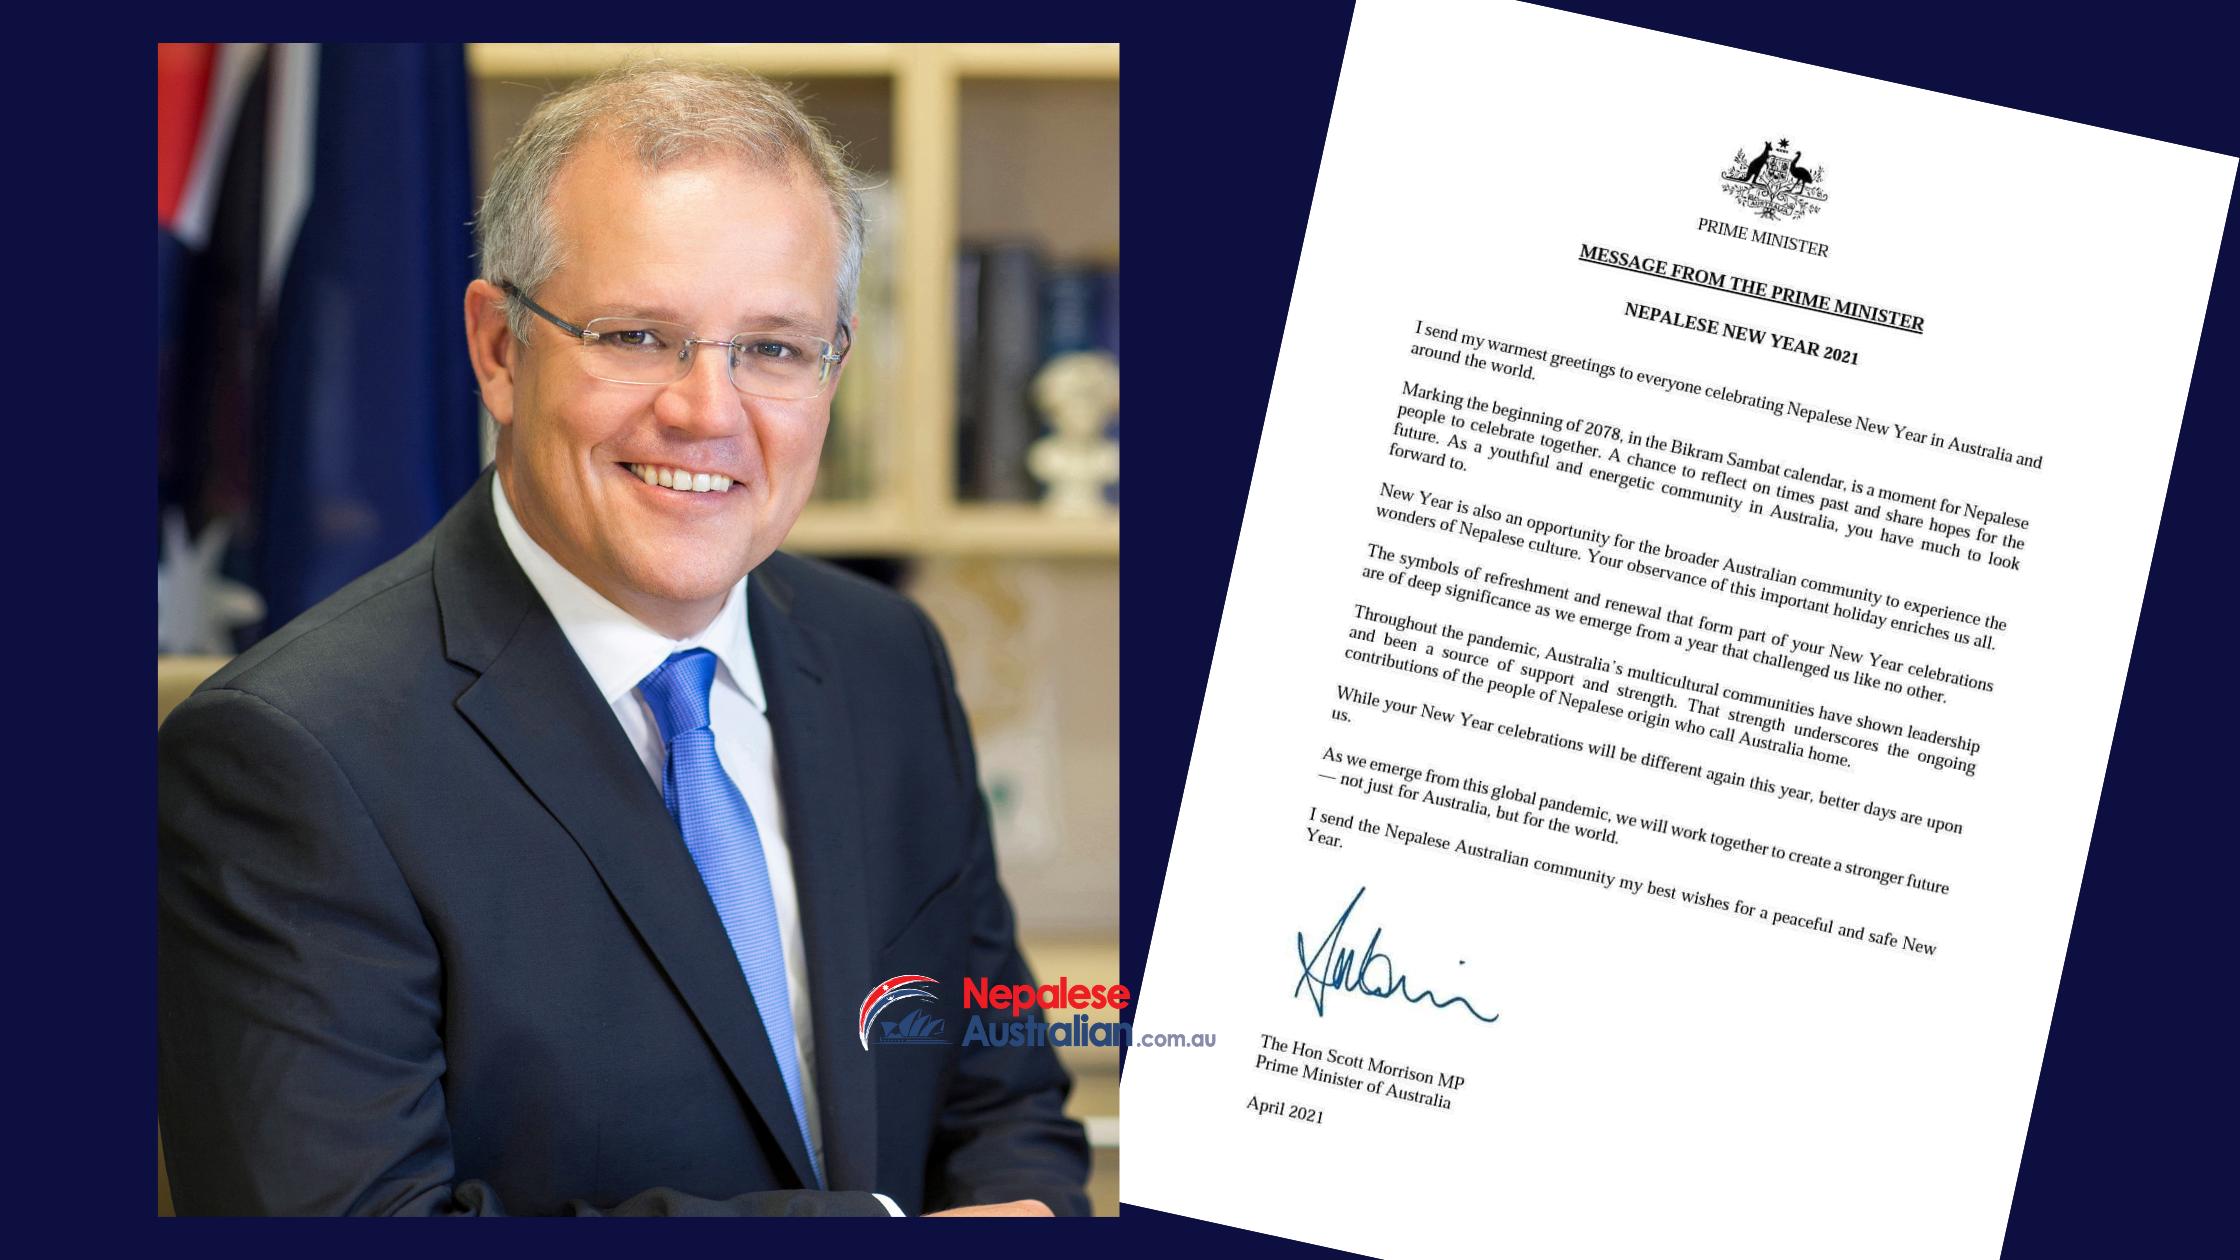 Nepali New Year 2078 Greetings Message from Australian Prime Minister Scott Morrison